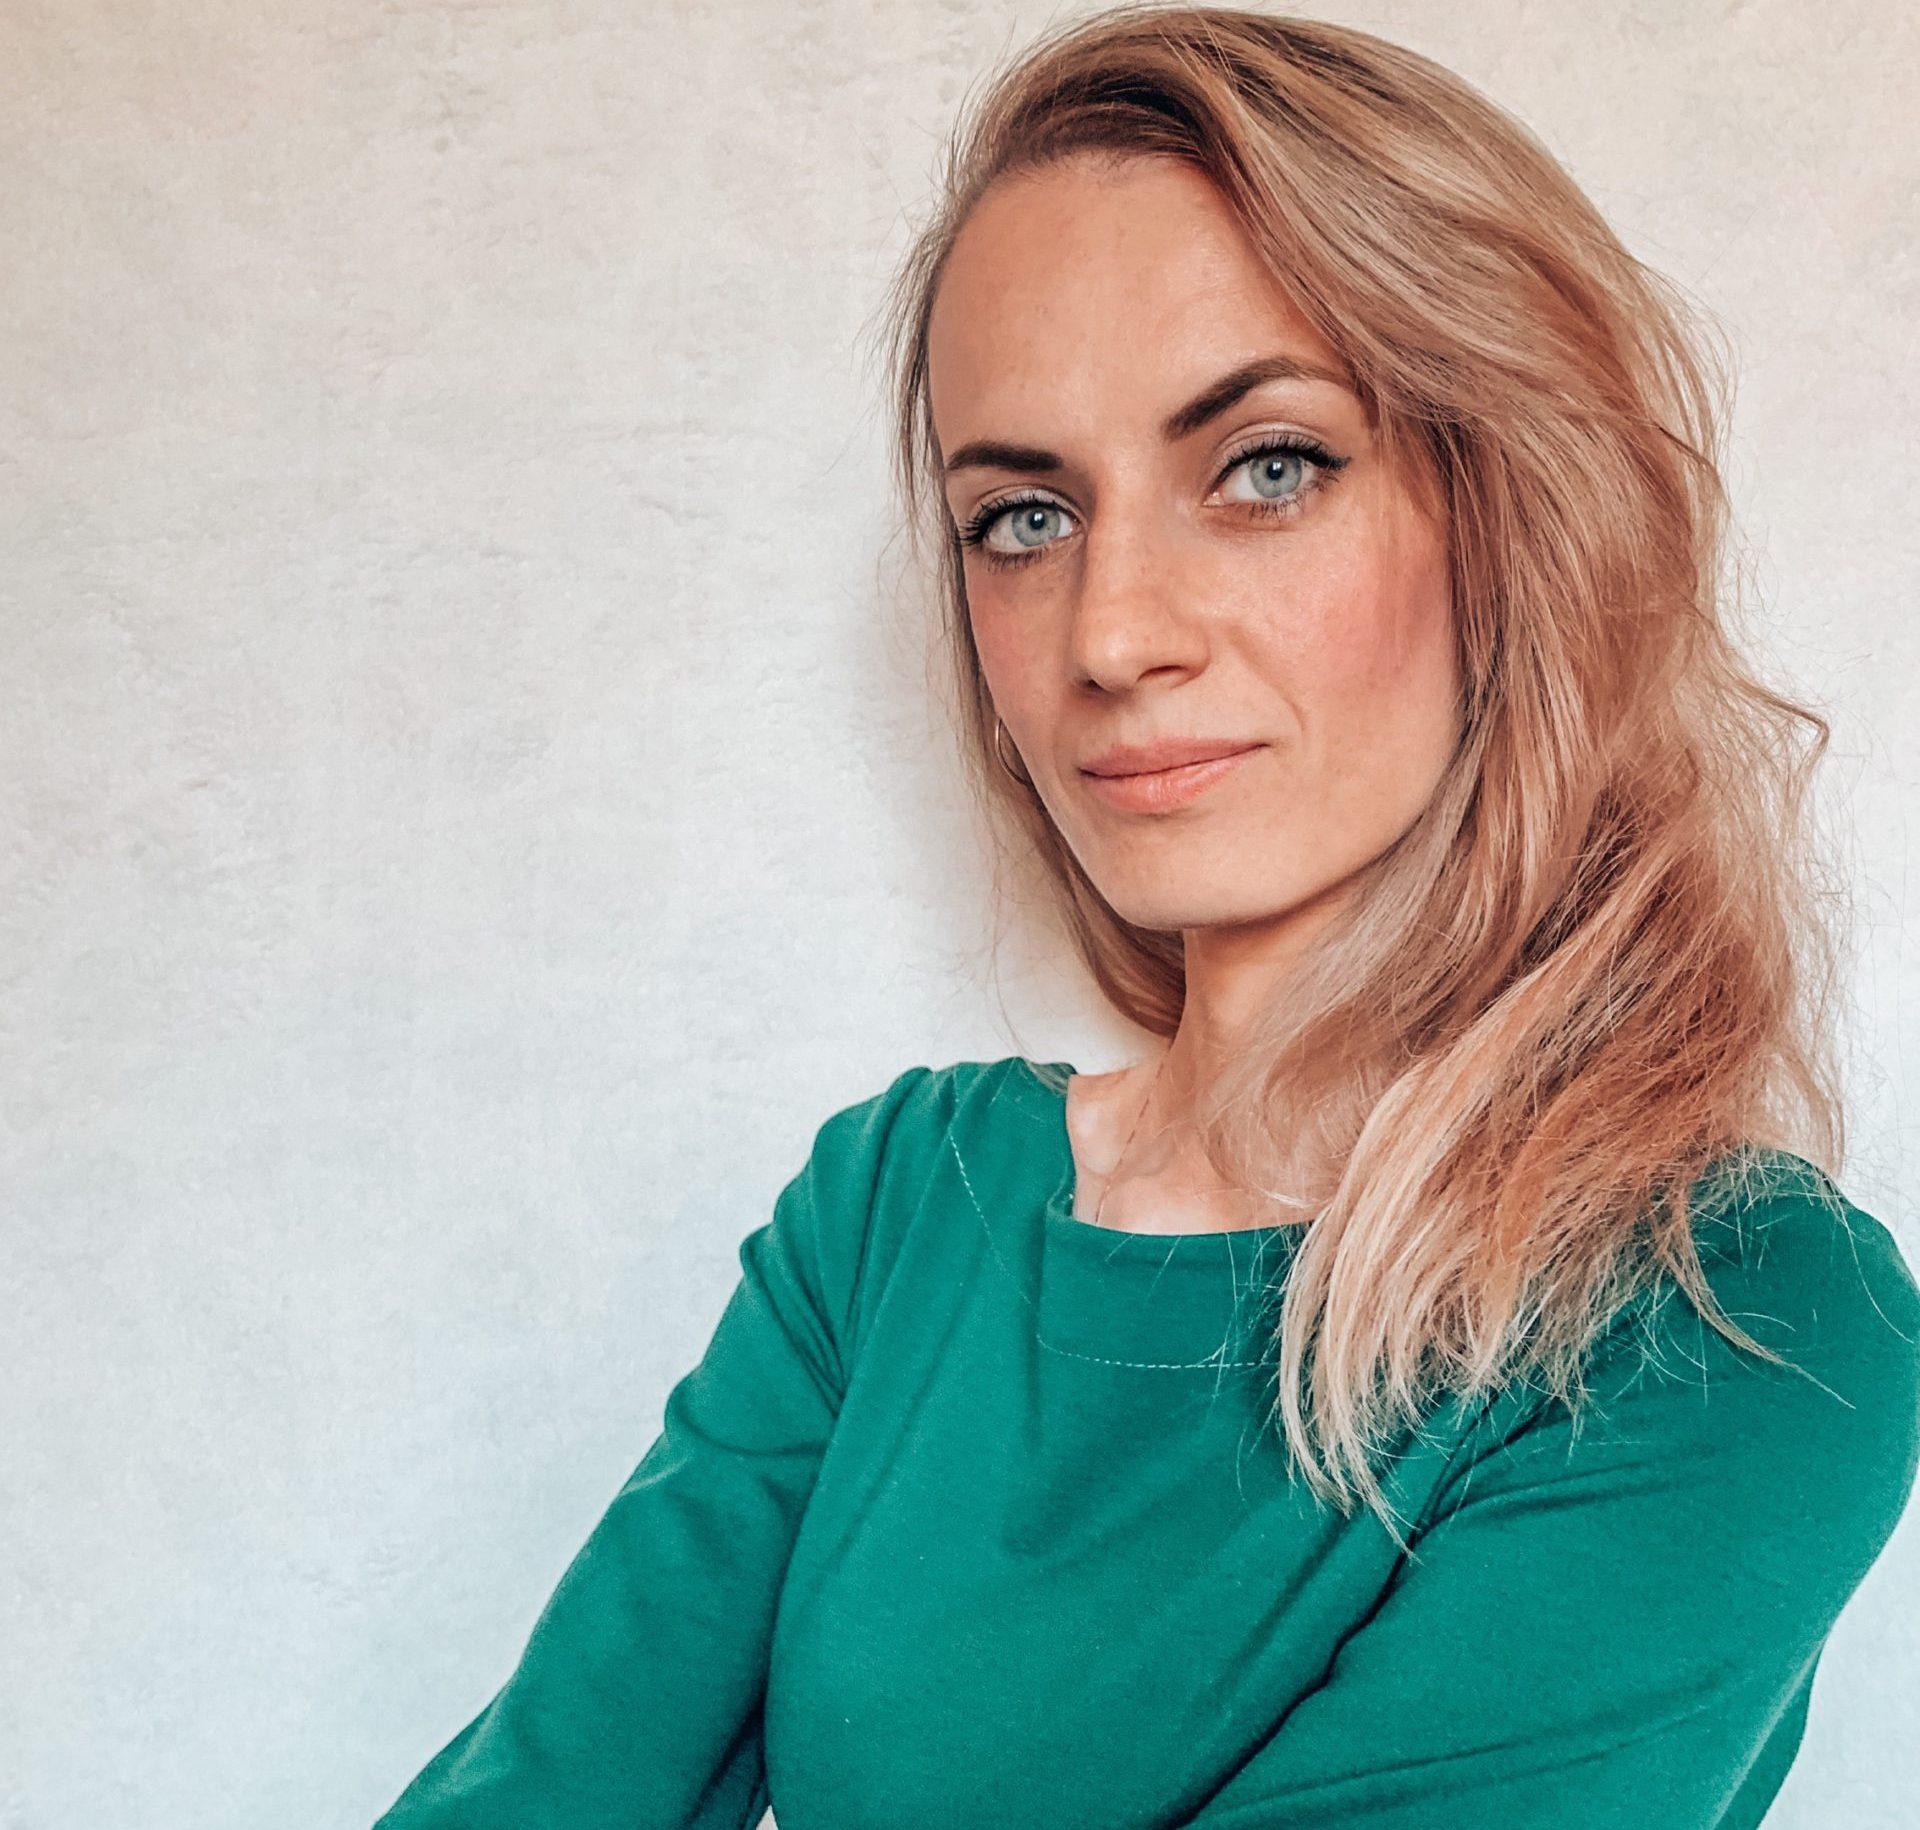 MARIYA BALASHOVA